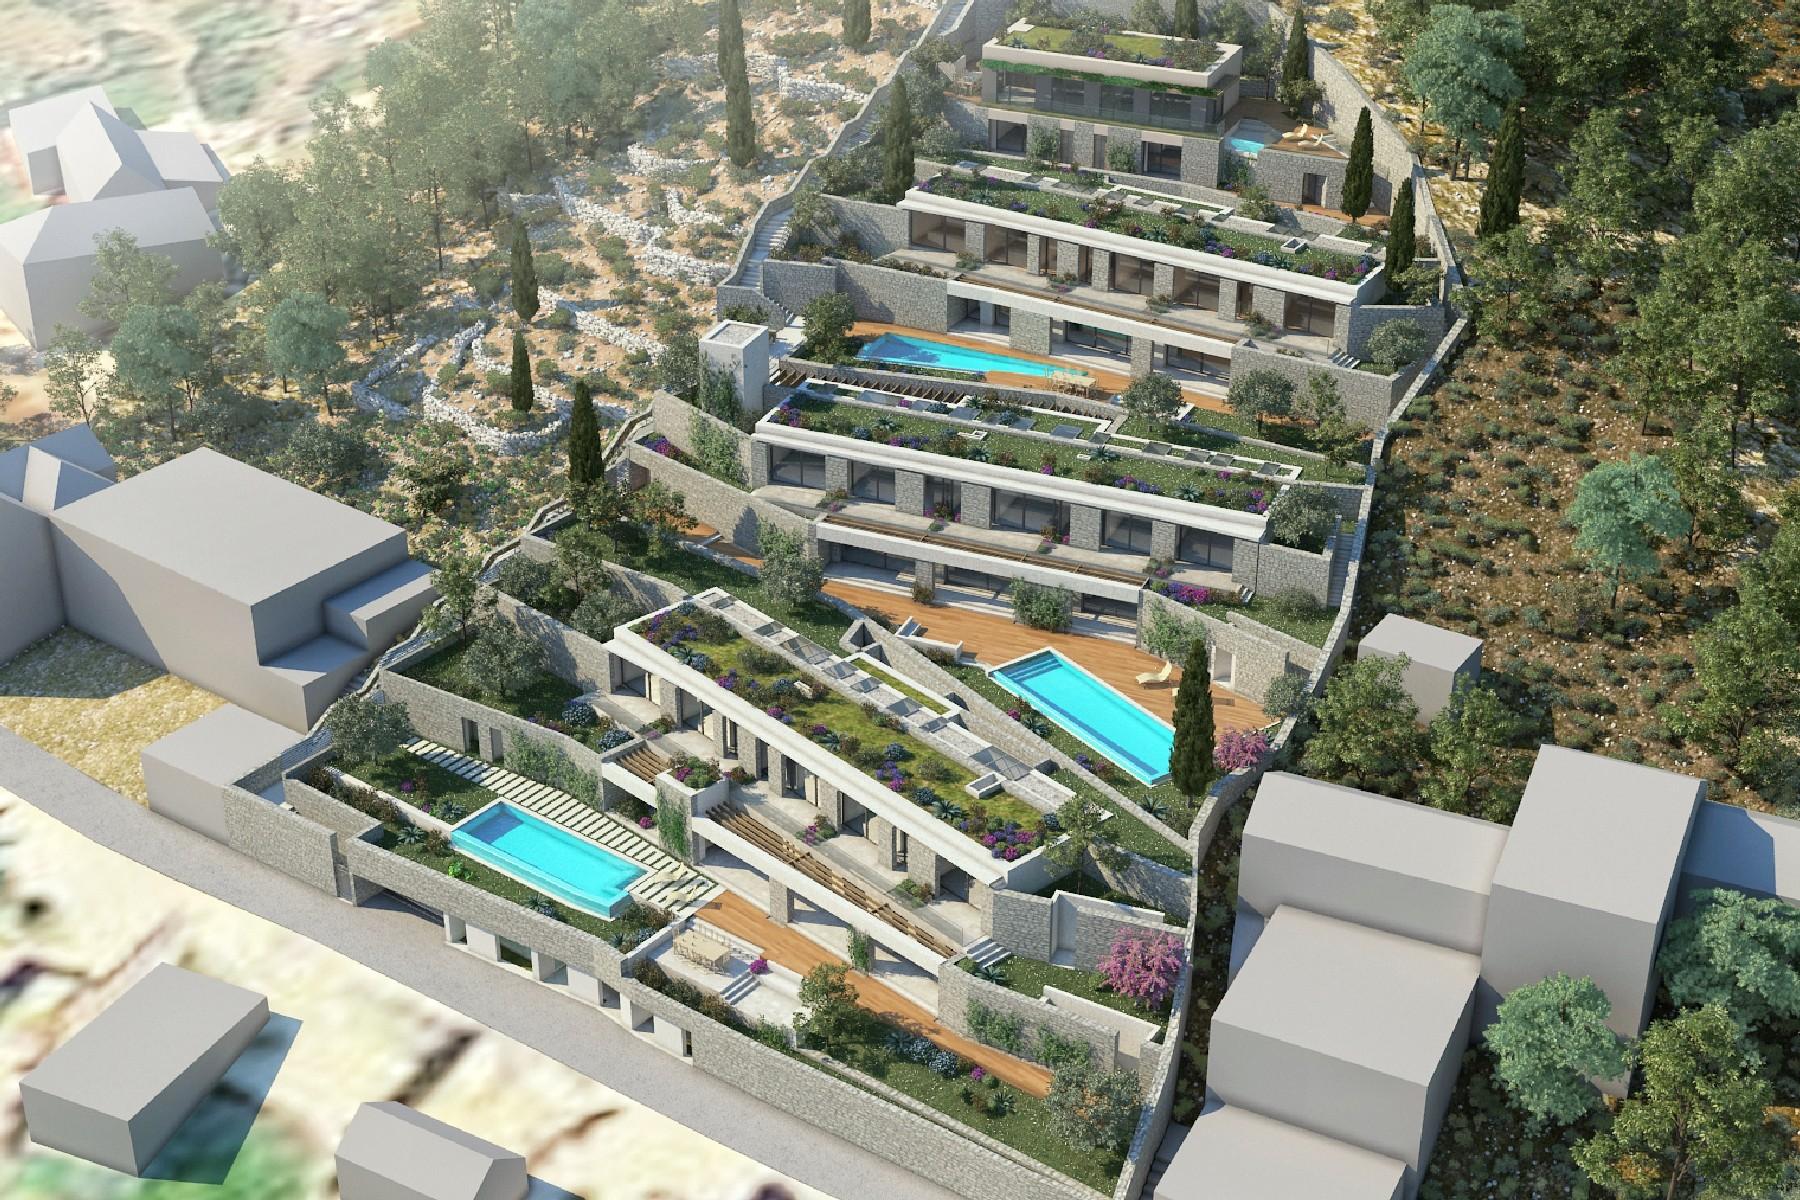 土地 为 销售 在 Building land with a project near Dubrovnik Other Dubrovnik Neretva, Dubrovnik Neretva, 20234 Croatia